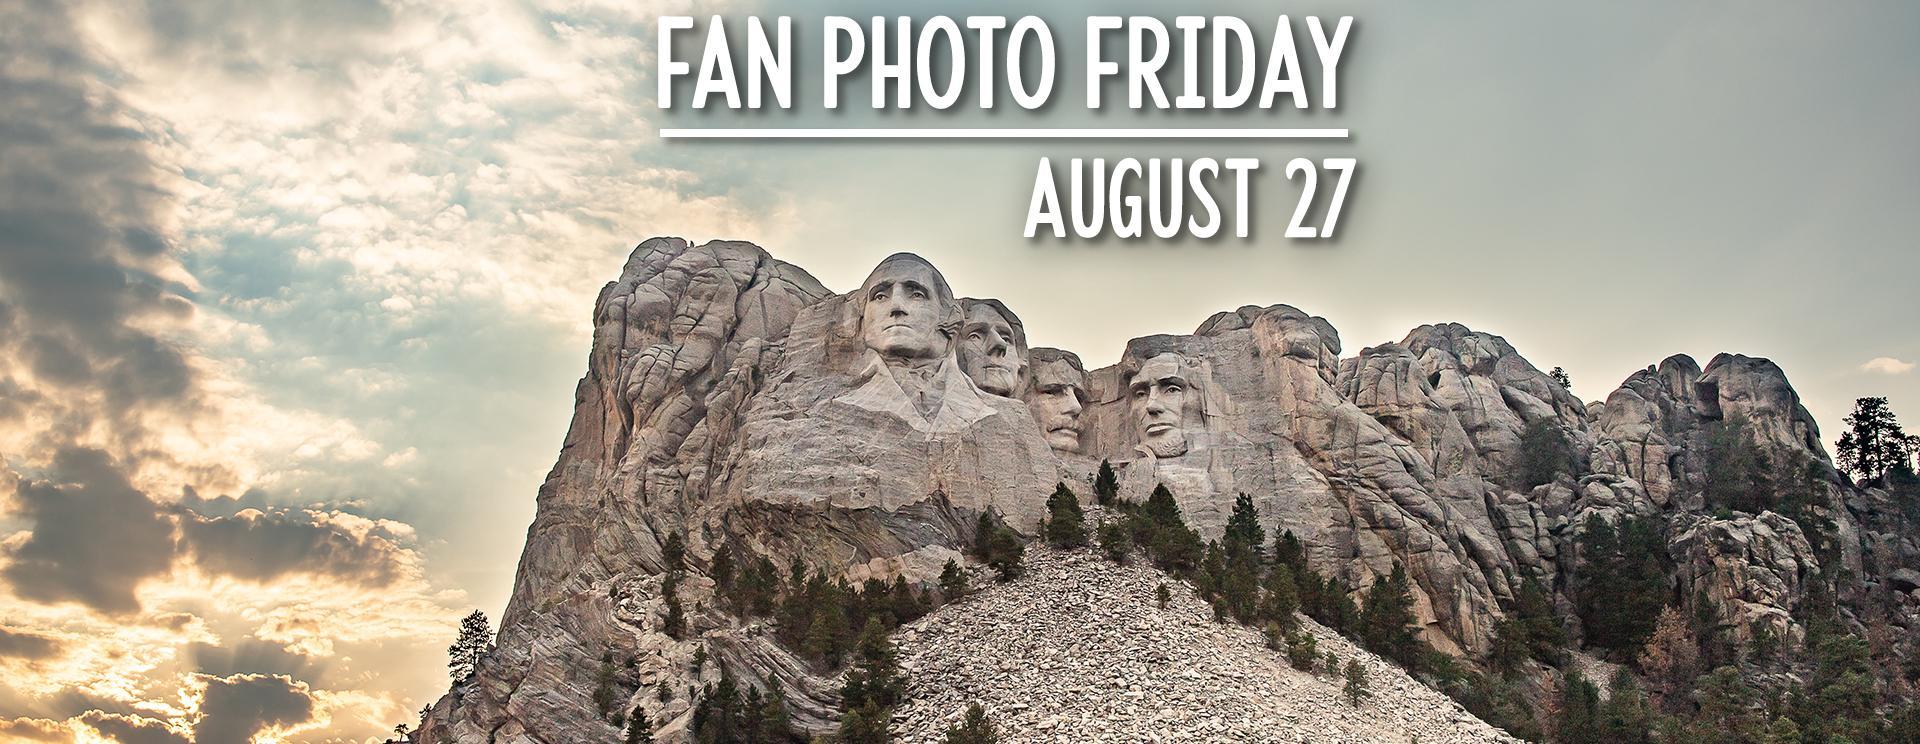 Fan Photo Friday | Aug. 27, 2021